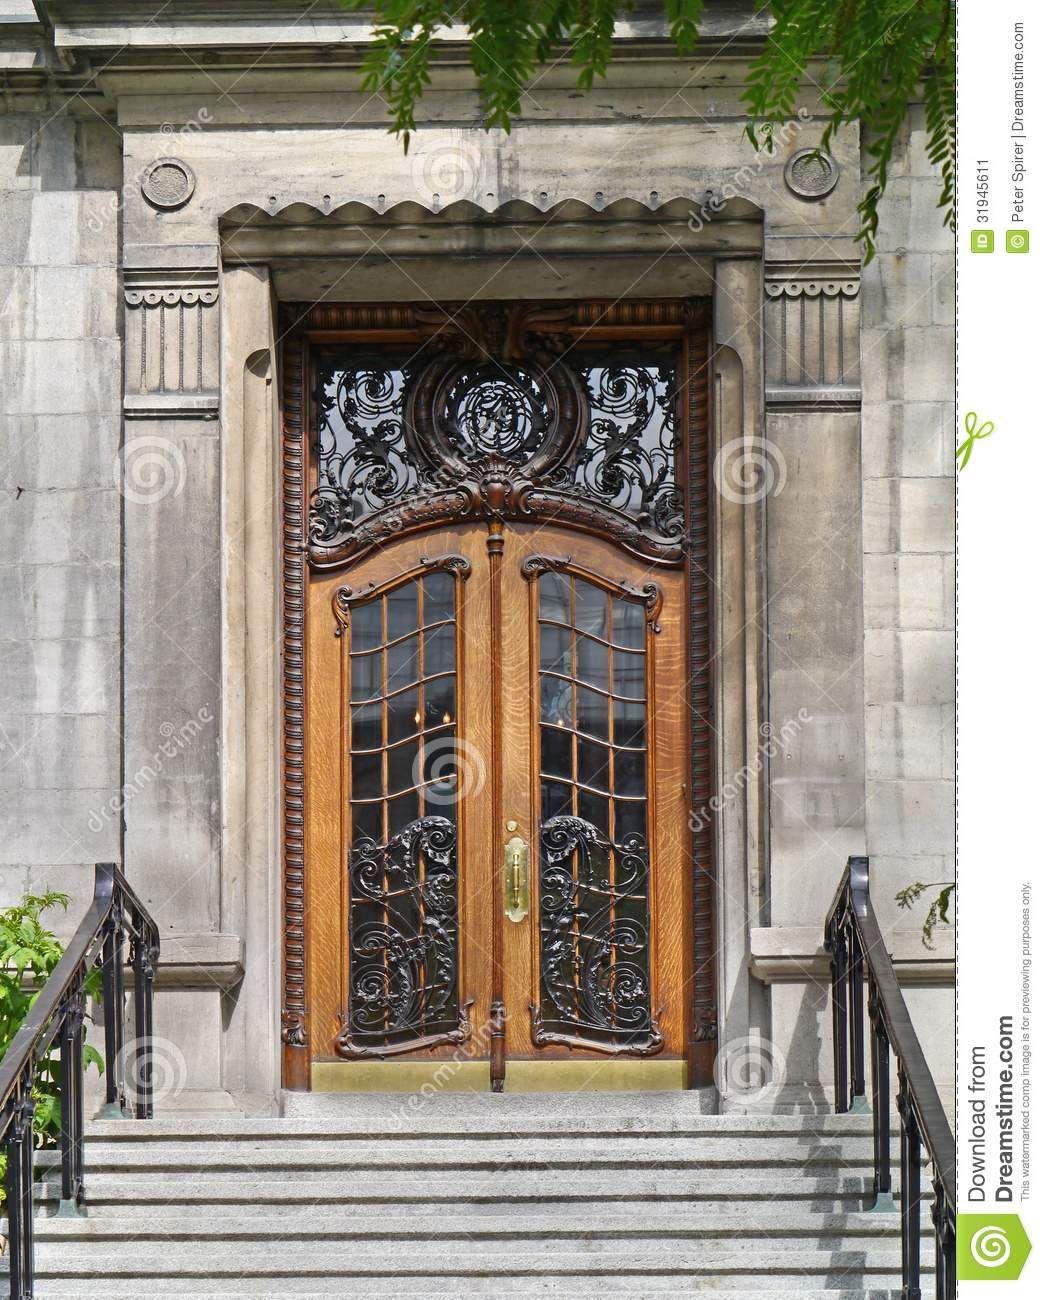 Apartment Building Front elegant-front-door-old-apartment-building-hotel-31945611 (1045